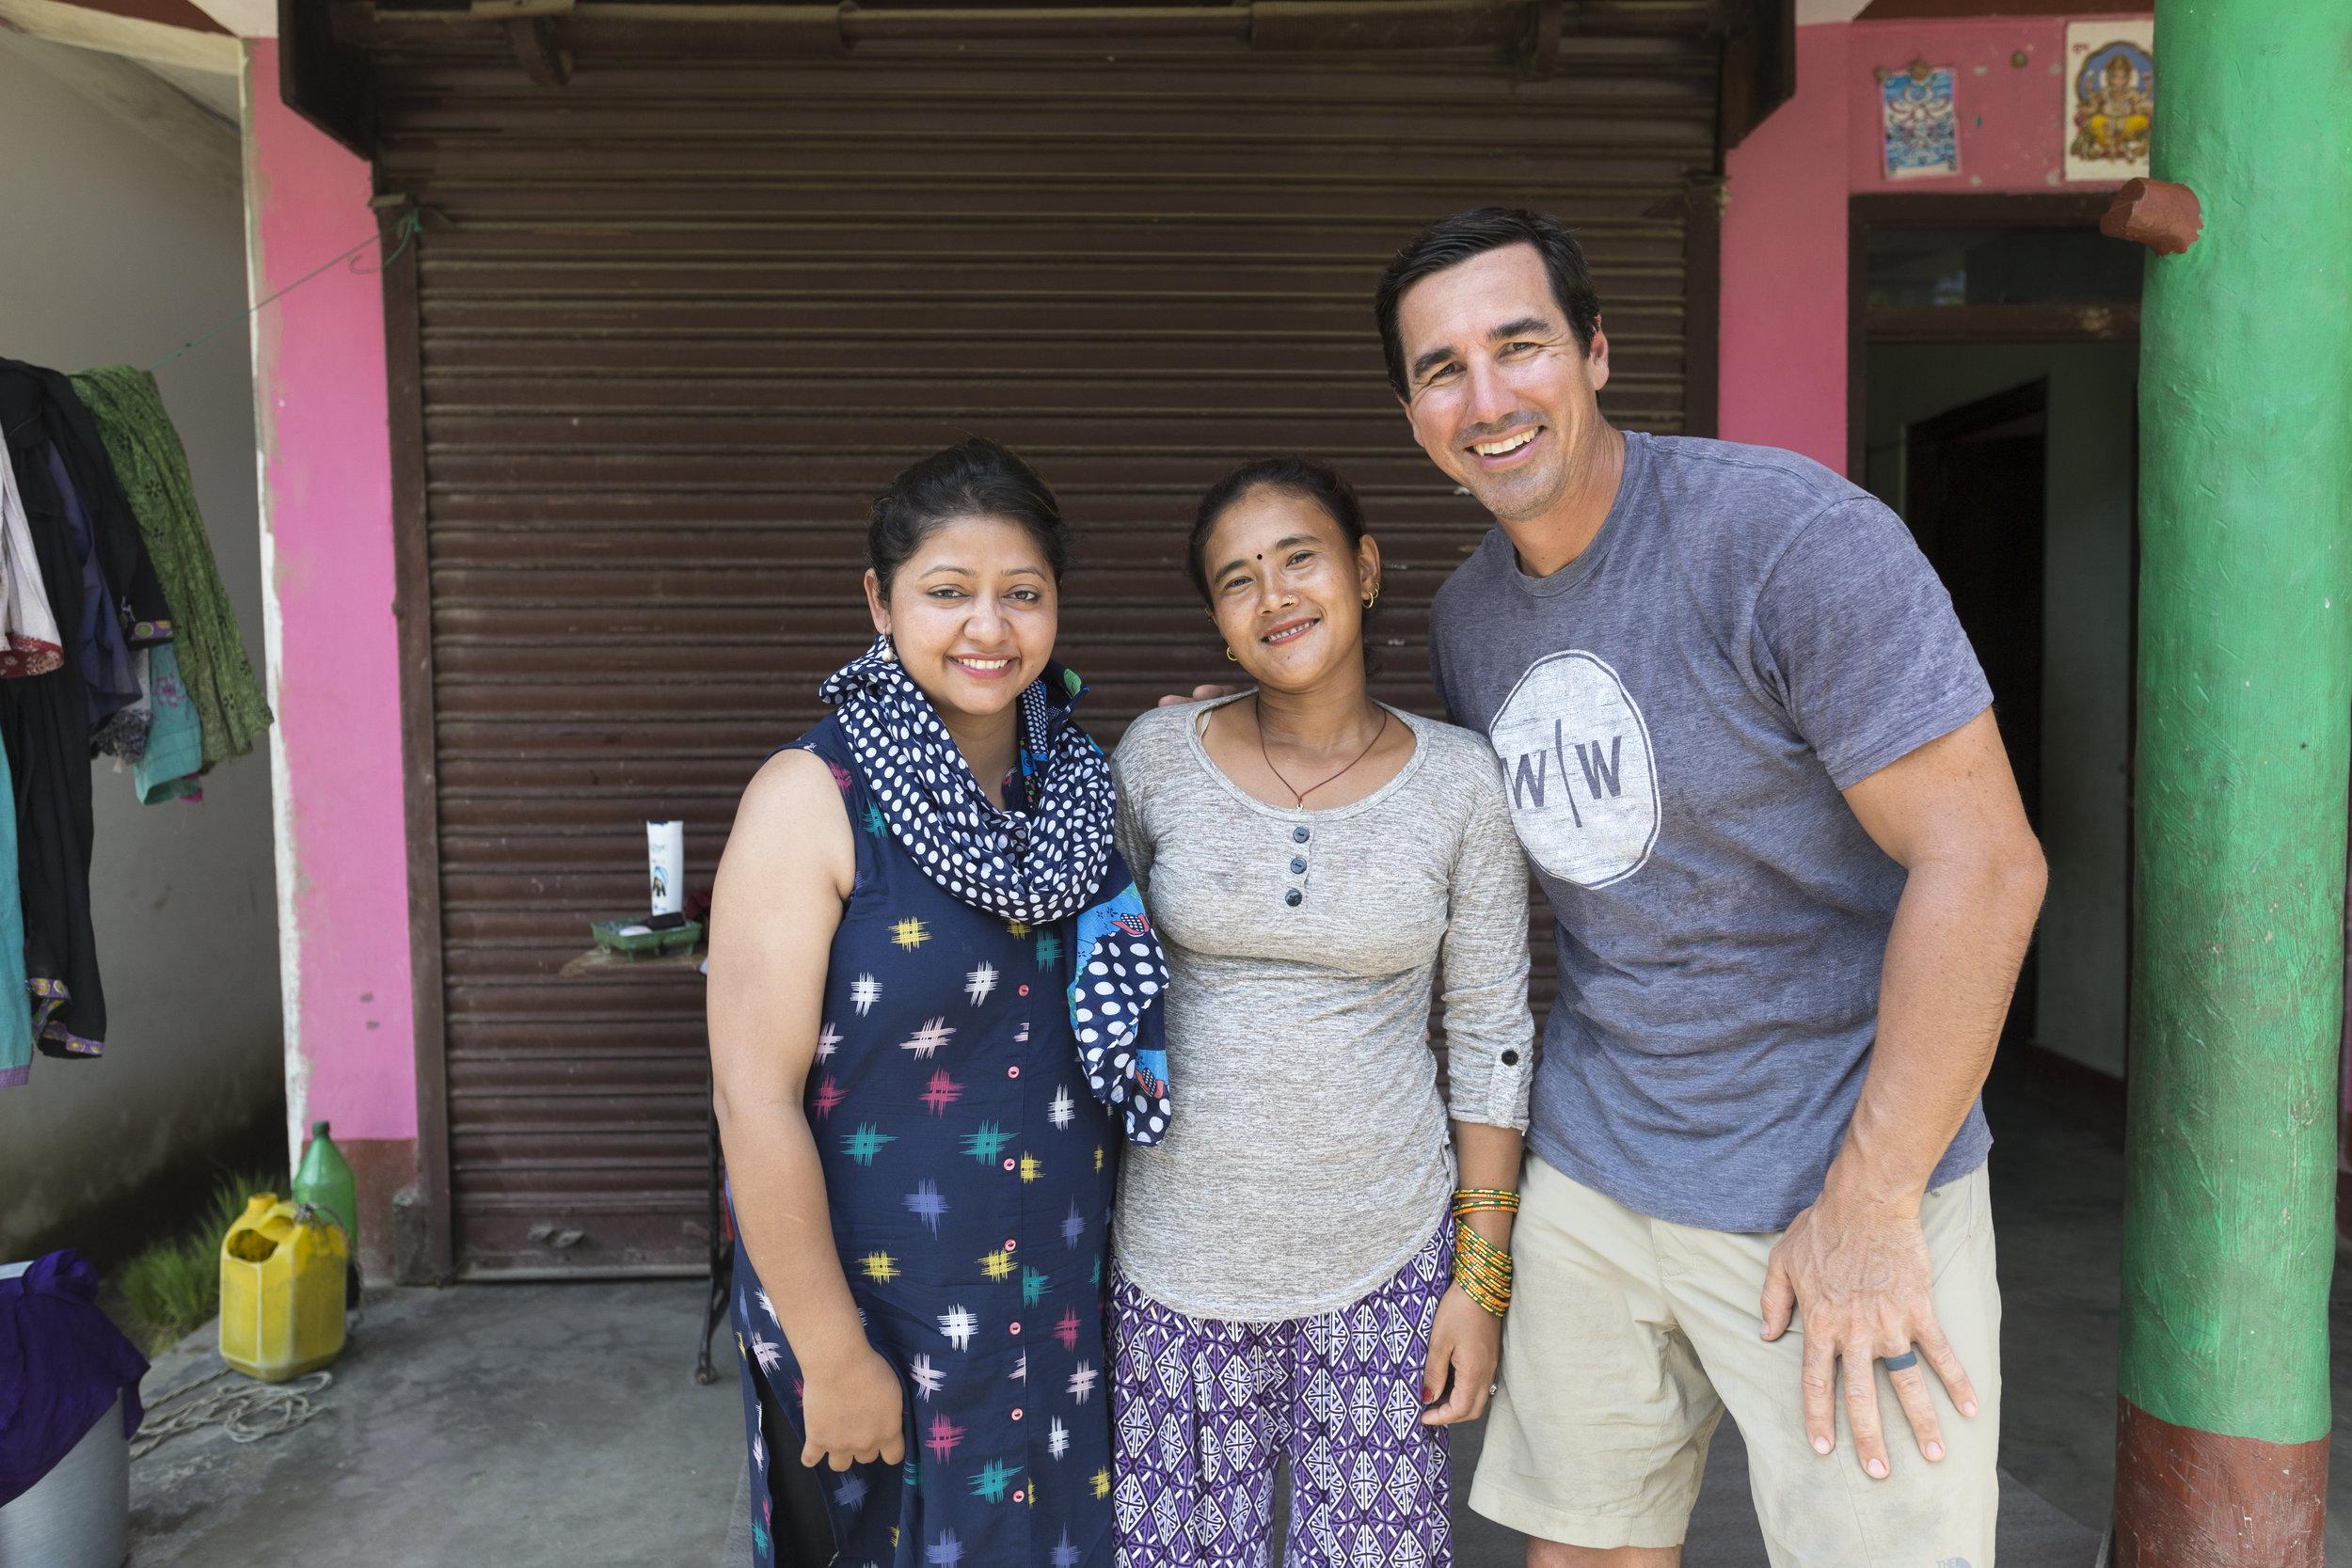 Roshani and David talk with the Raitole president of the water user group committee, Naramaya Rai (center).